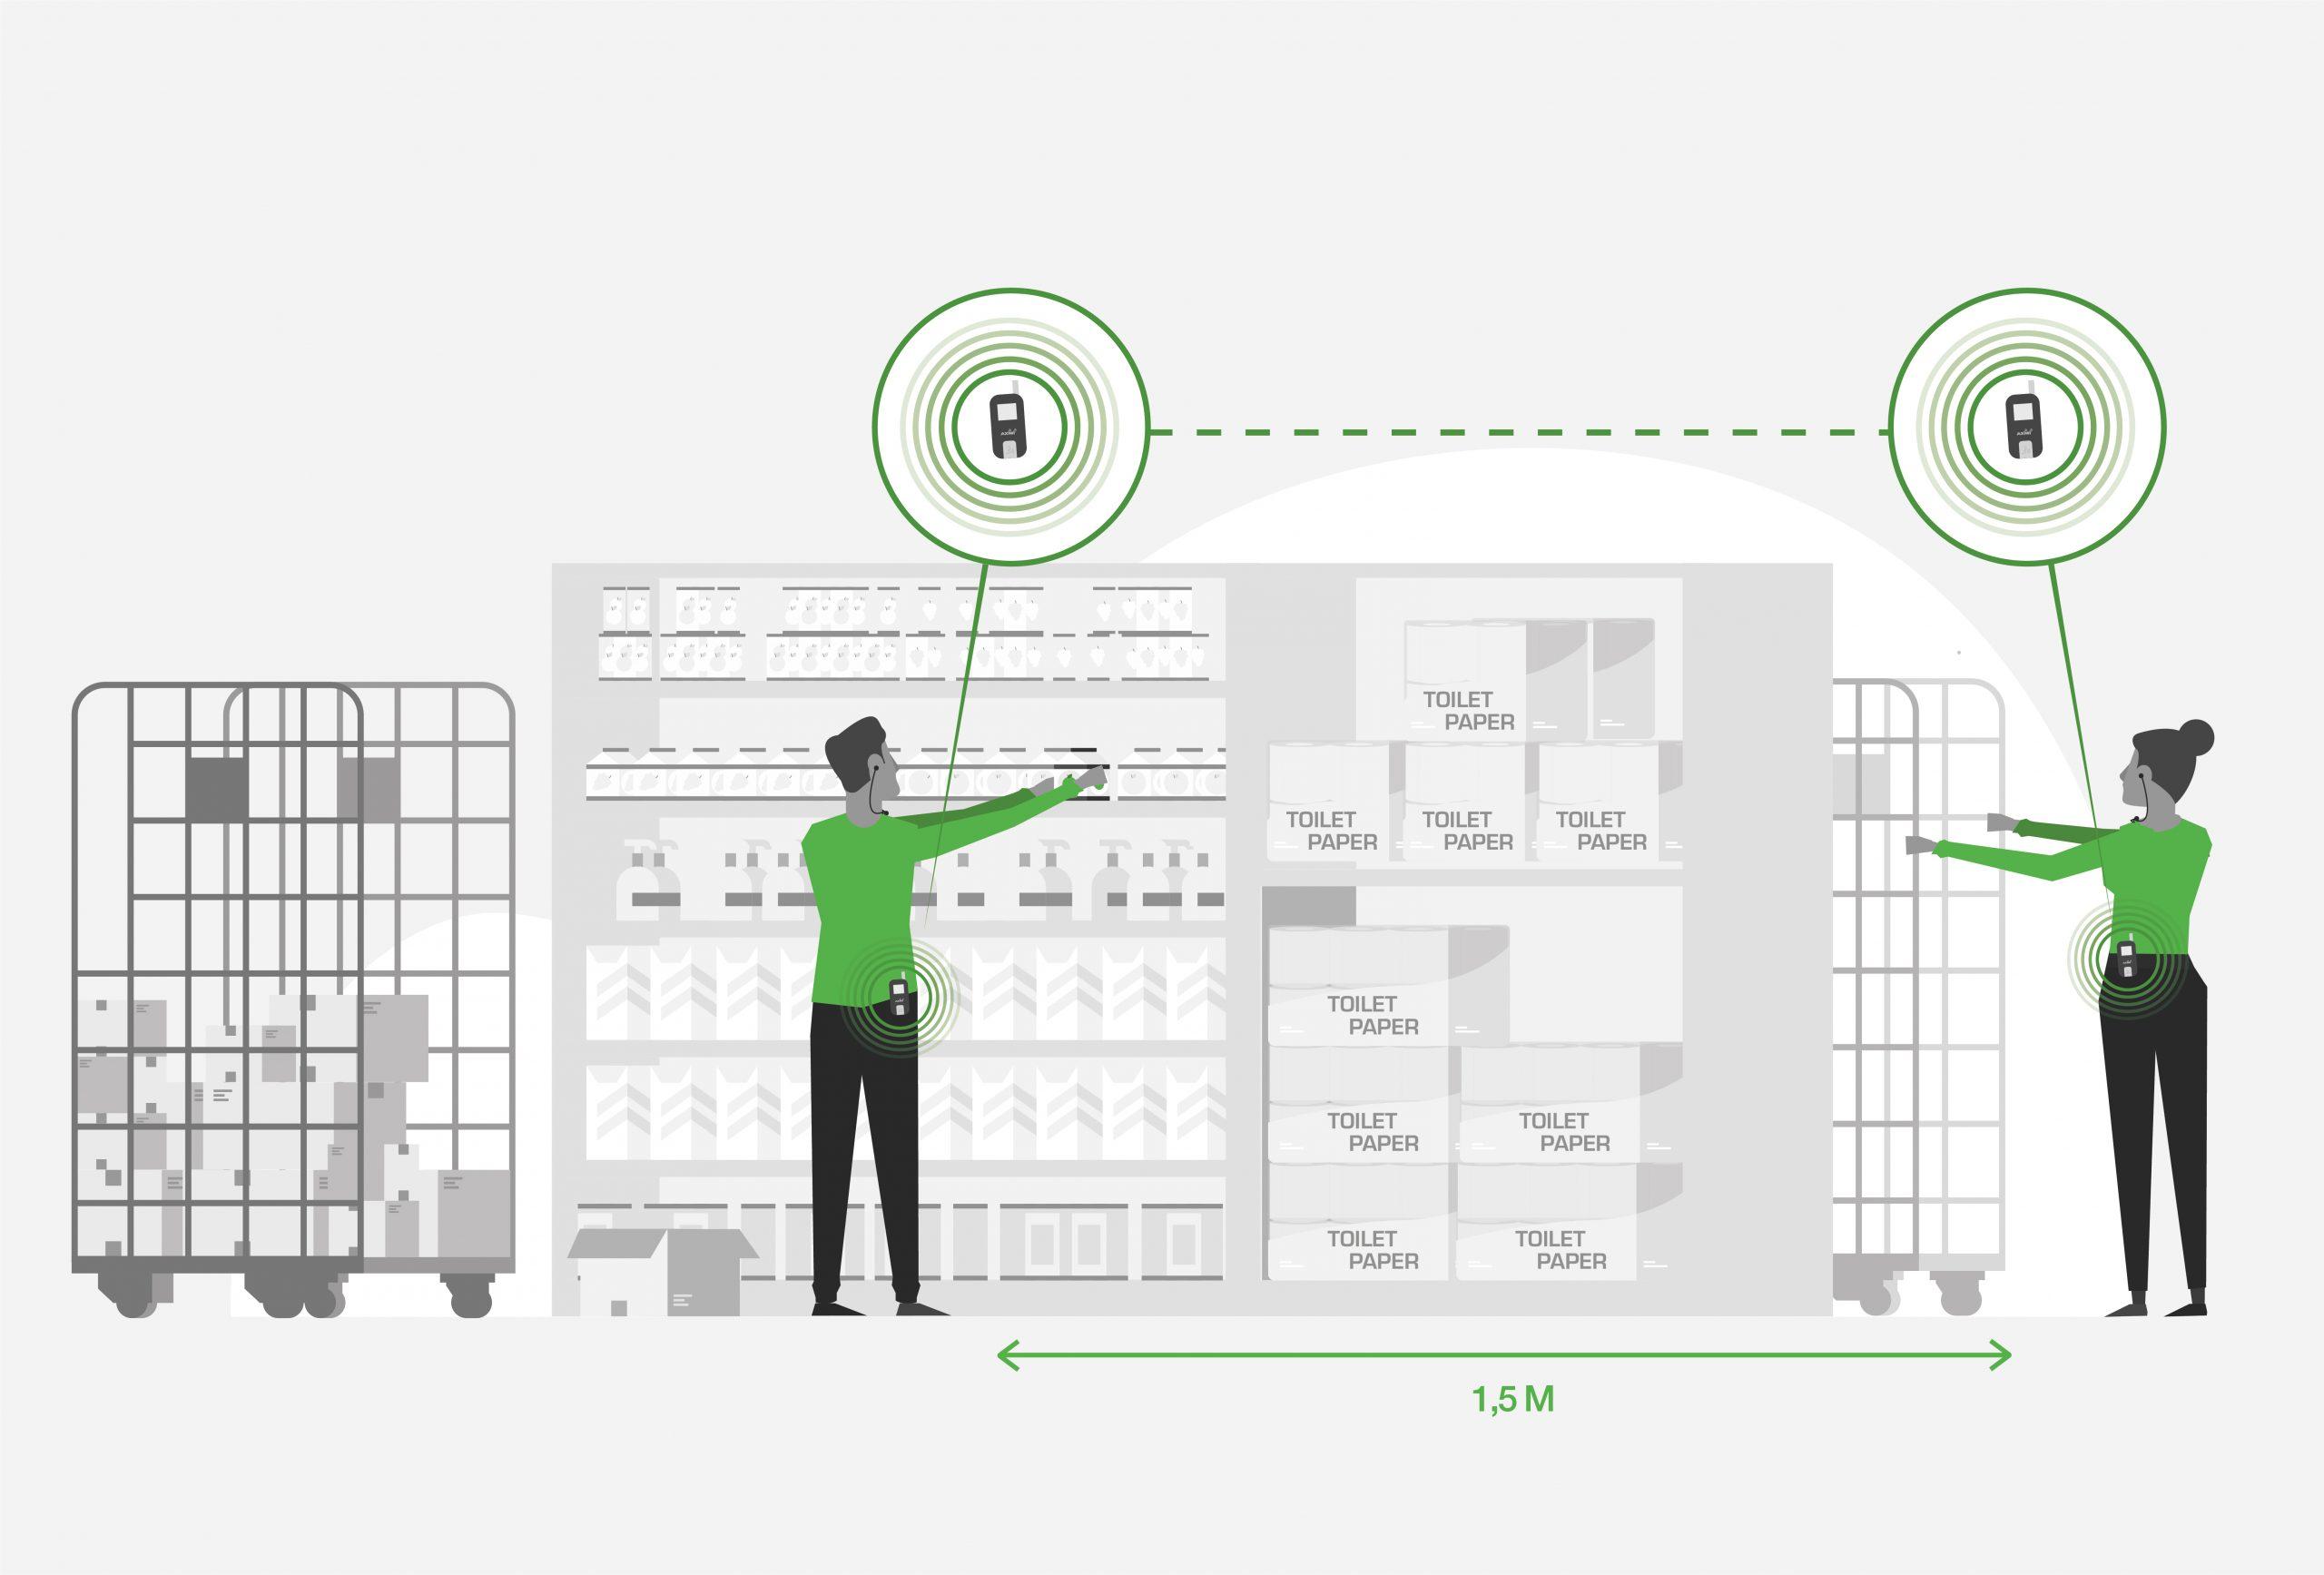 axiwi-drahtlosen-kommunikationssteme-logistik-supermarkt